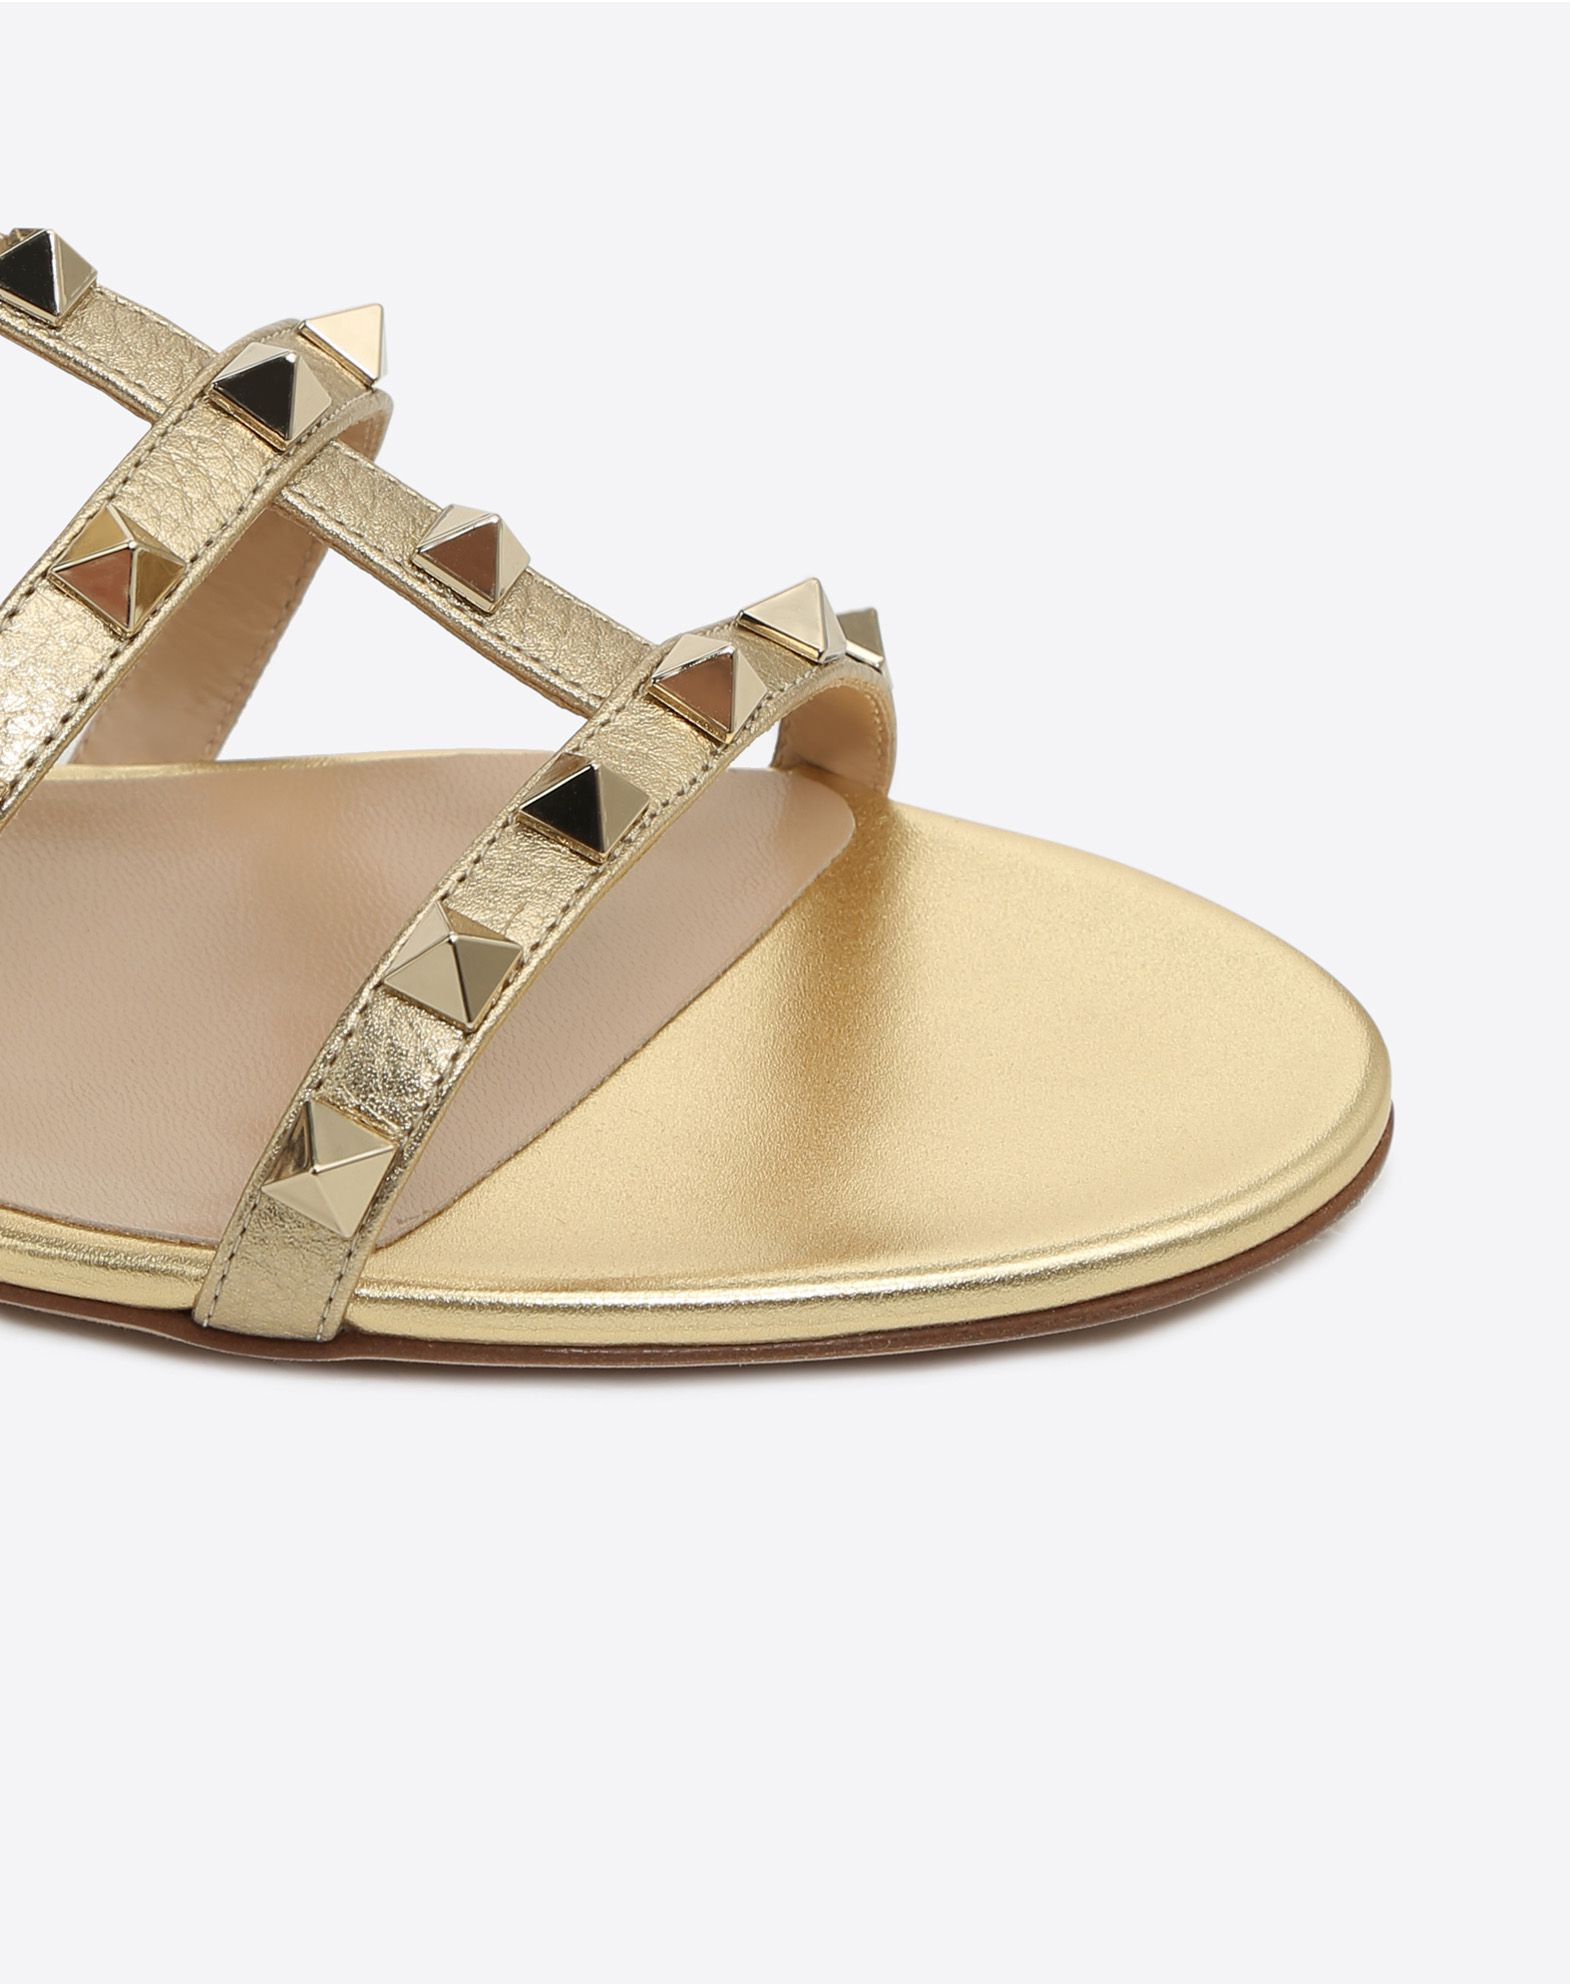 VALENTINO GARAVANI Rockstud slide sandal SLIDE SANDAL D b